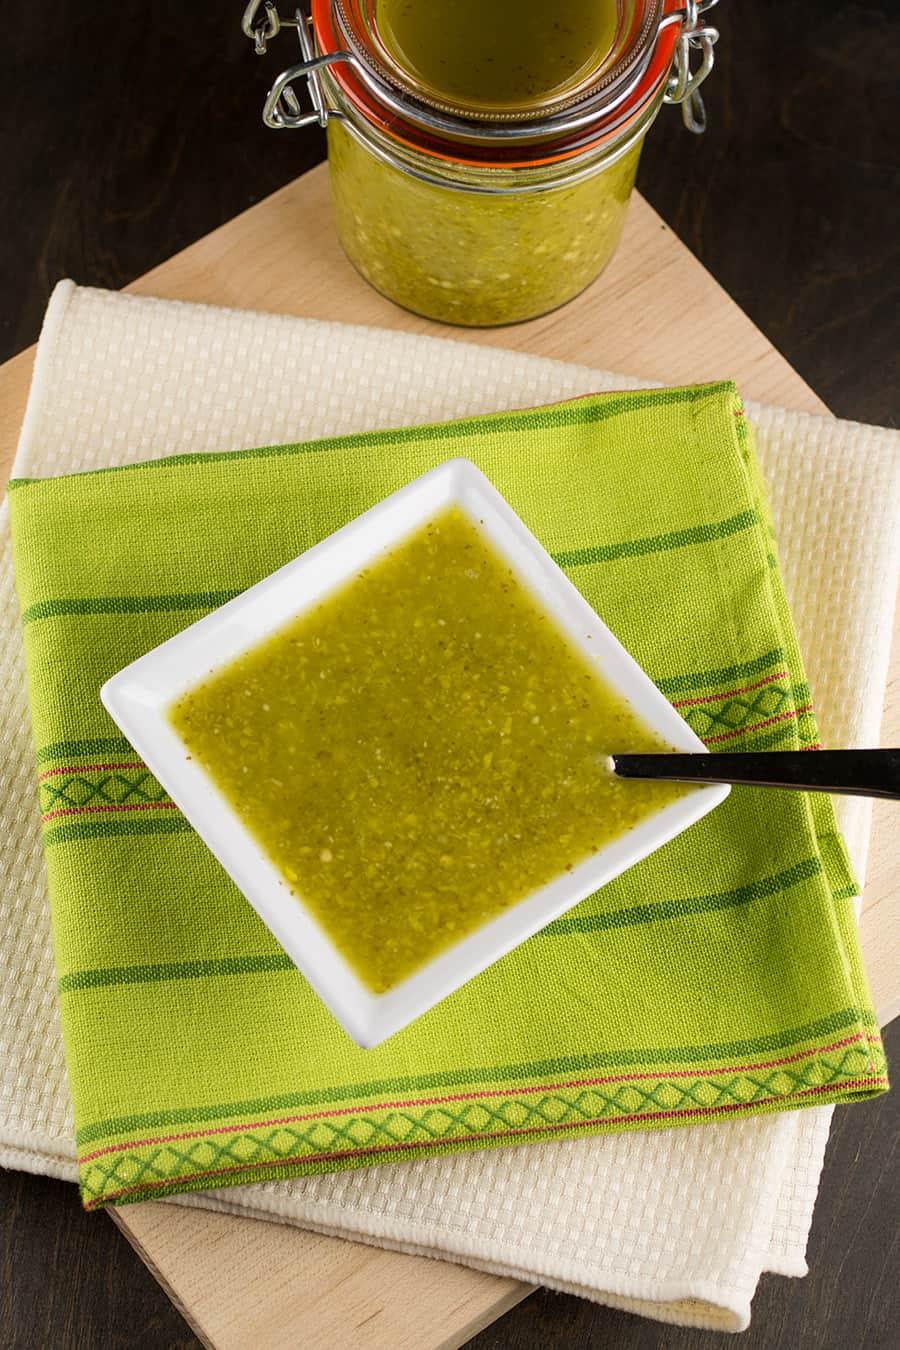 Aji Pineapple Hot Sauce